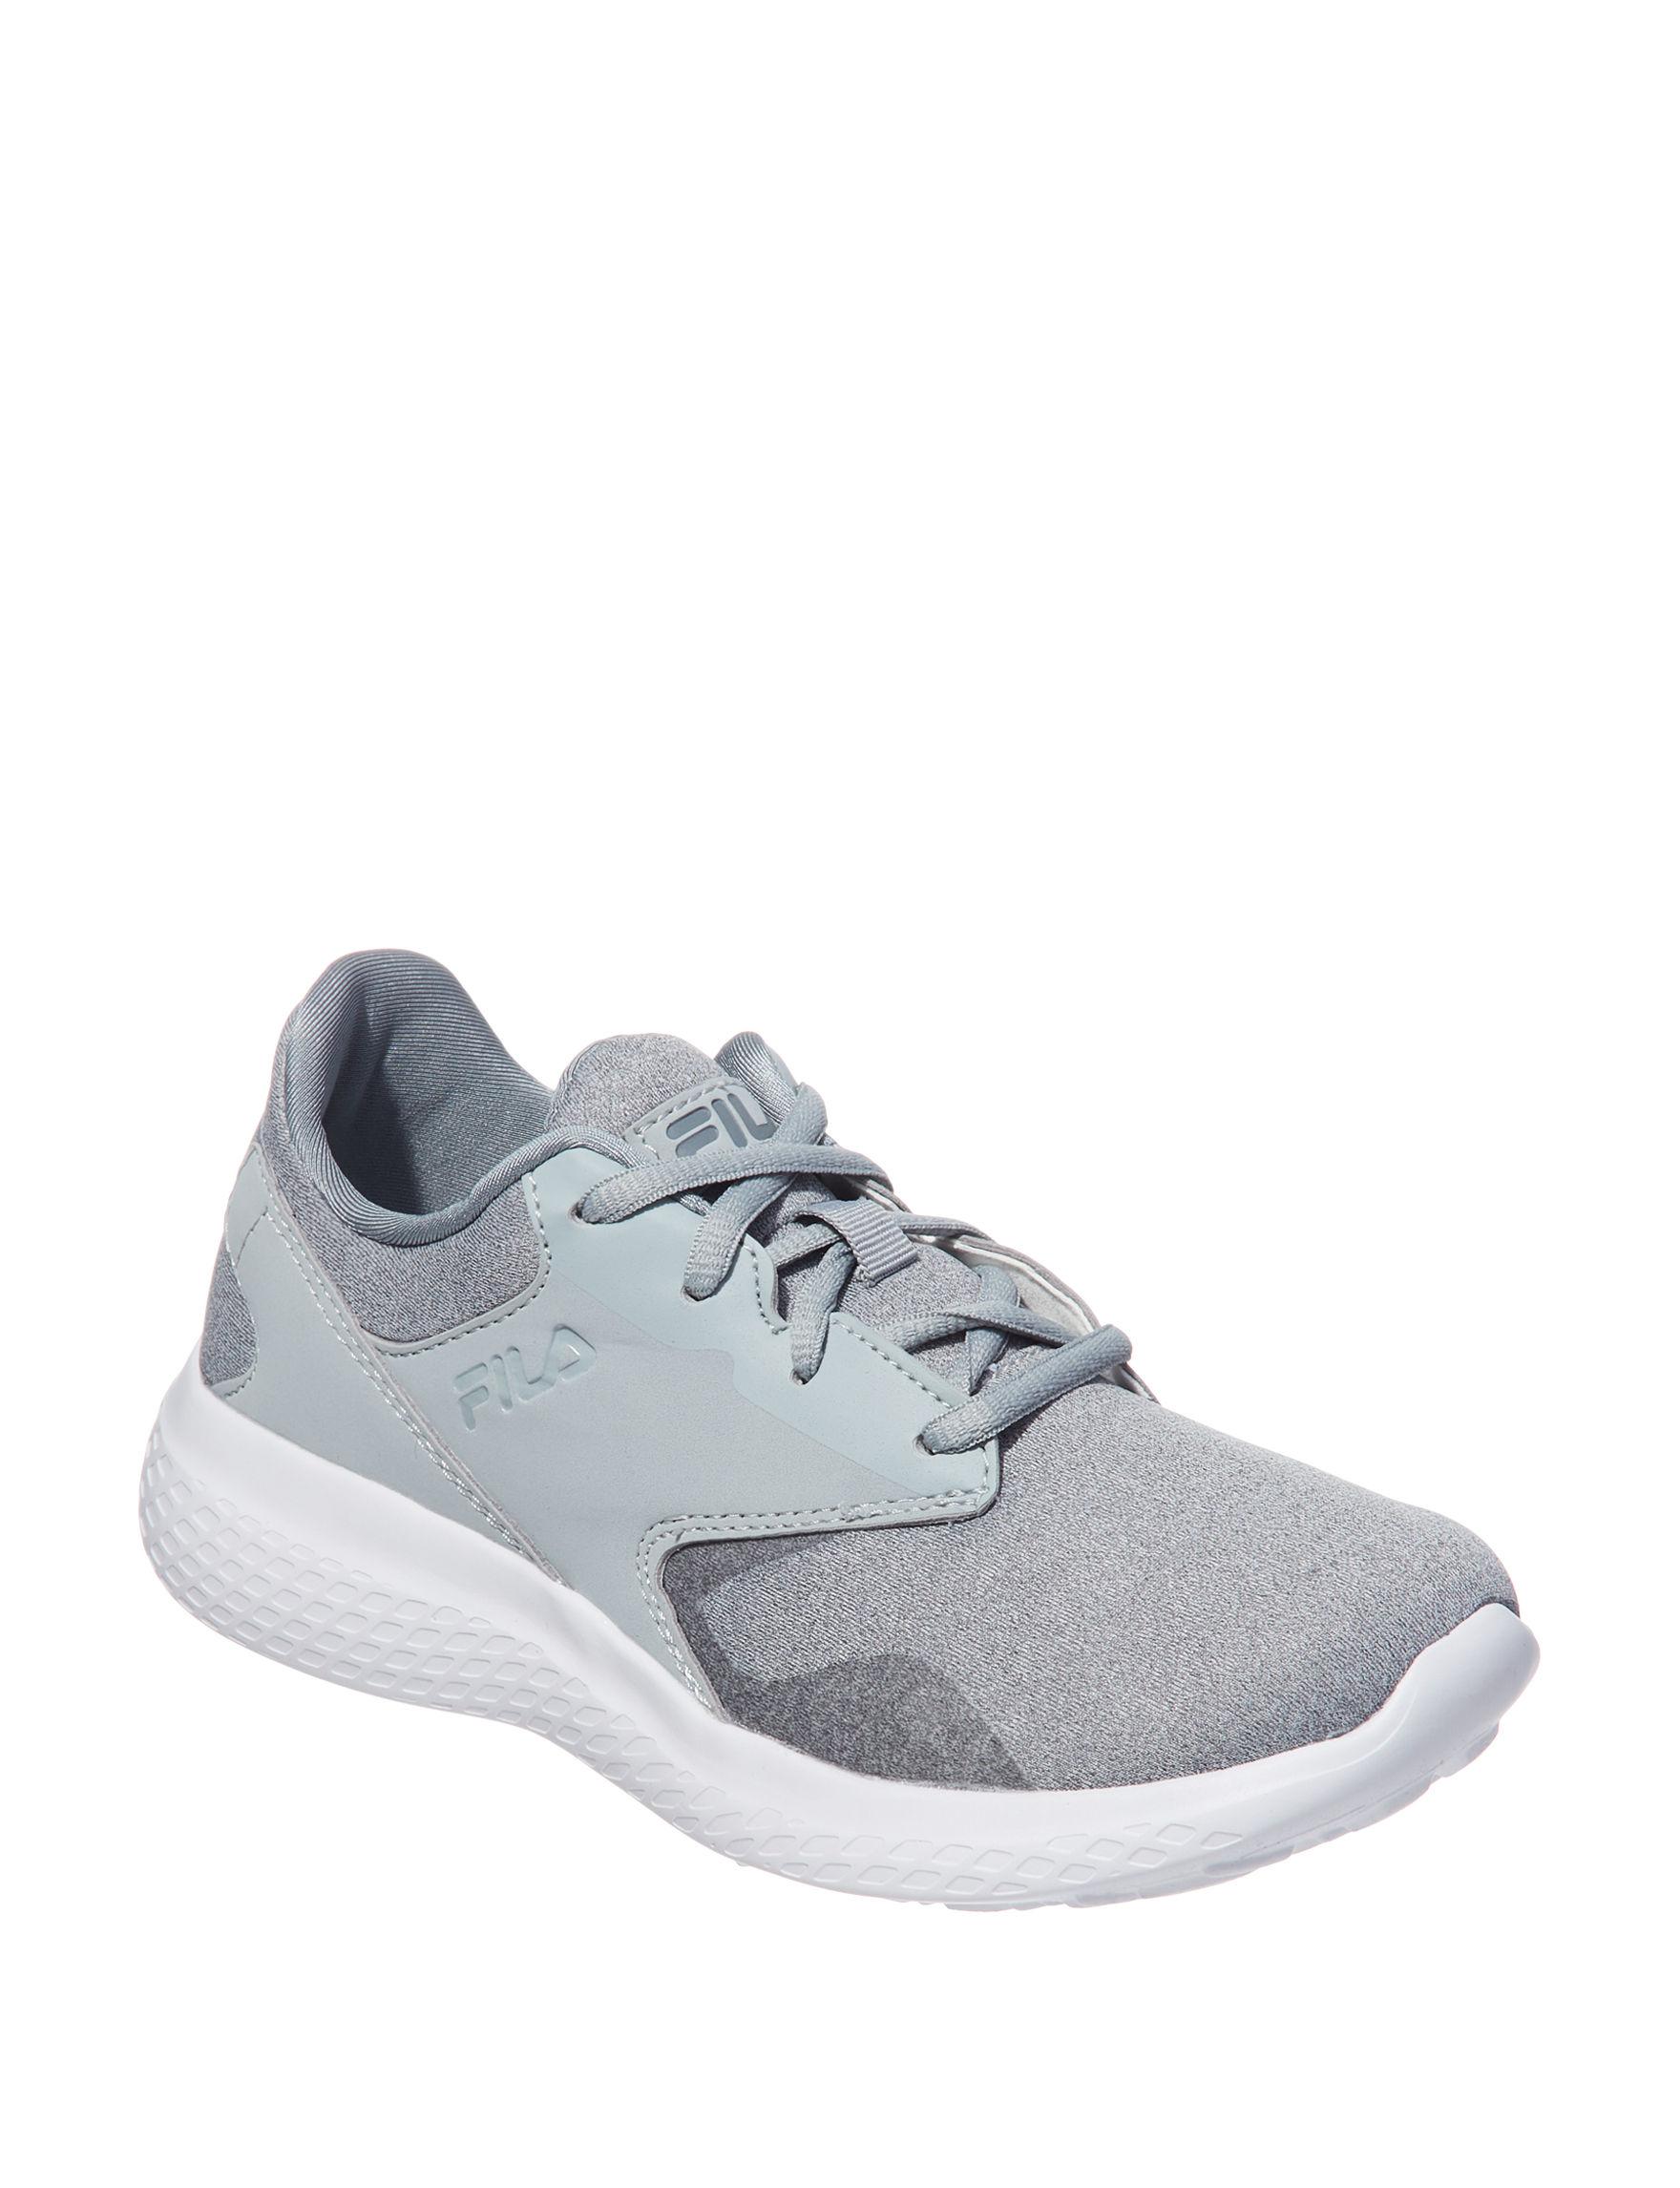 Fila Grey Comfort Shoes